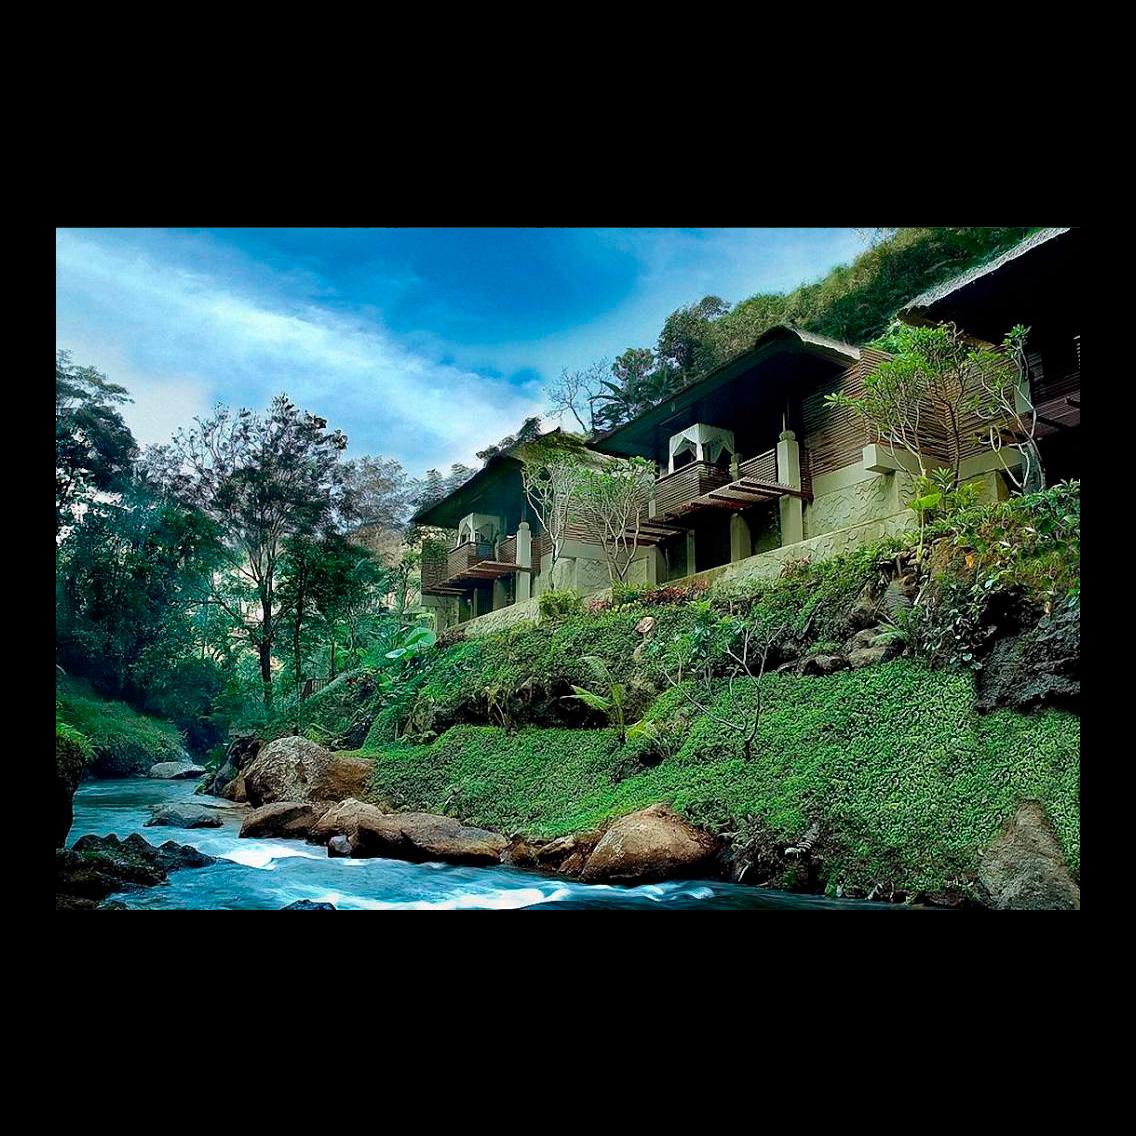 Maya Ubud Resort And Spa / Denton Corker Marshall